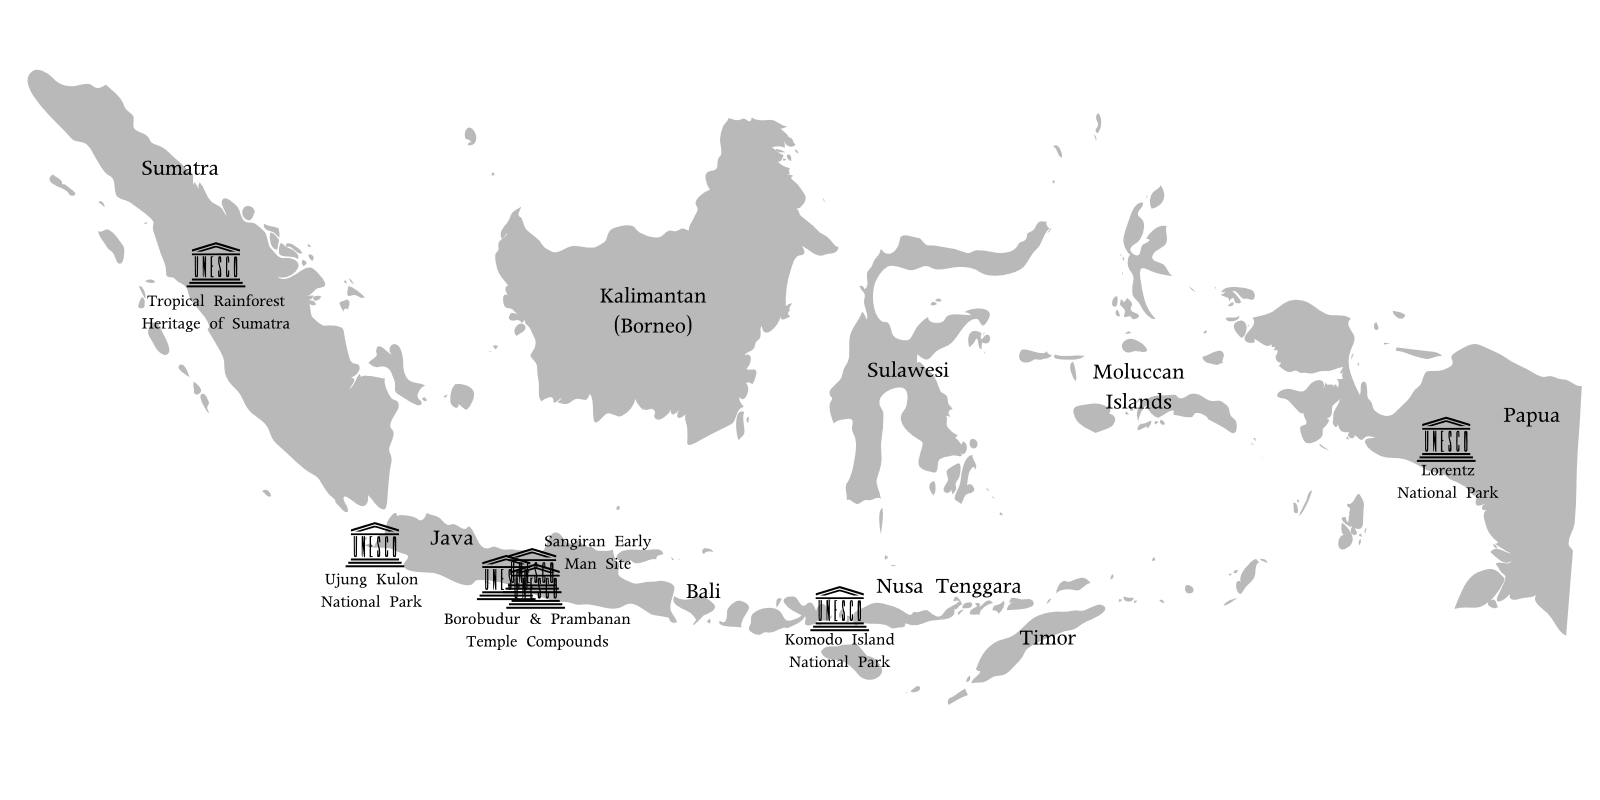 Wallpaper Seram 3d World Heritage Indonesia Mapsof Net